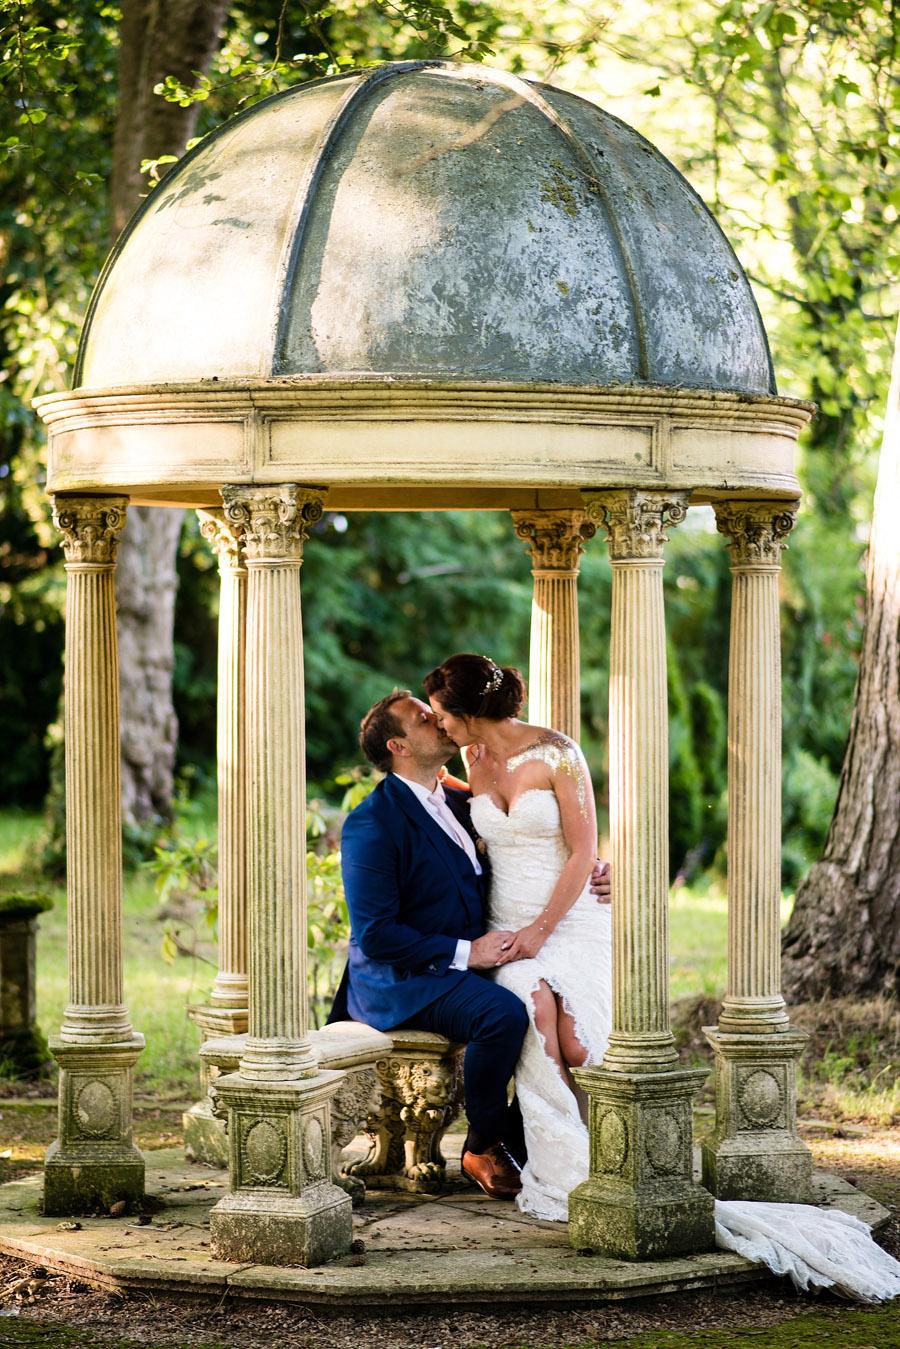 Traditional English wedding at Moxhull Hall Hotel, image credit Damian Burcher (32)